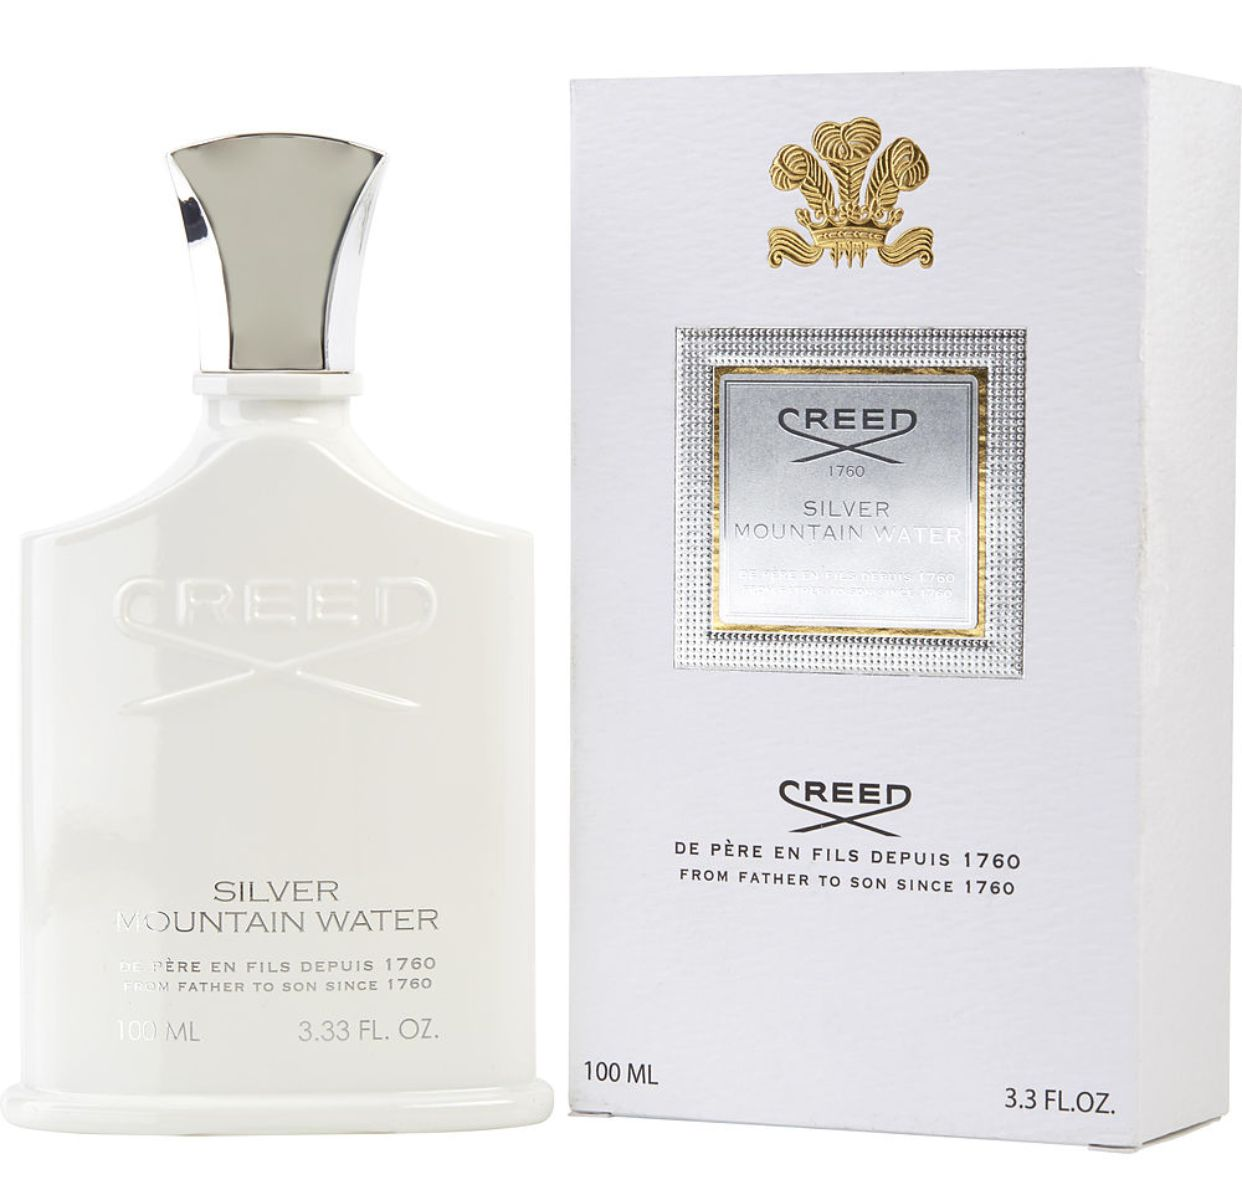 正品Creed Silver Mountain 信仰 银色山泉男士香水EDP 100ML